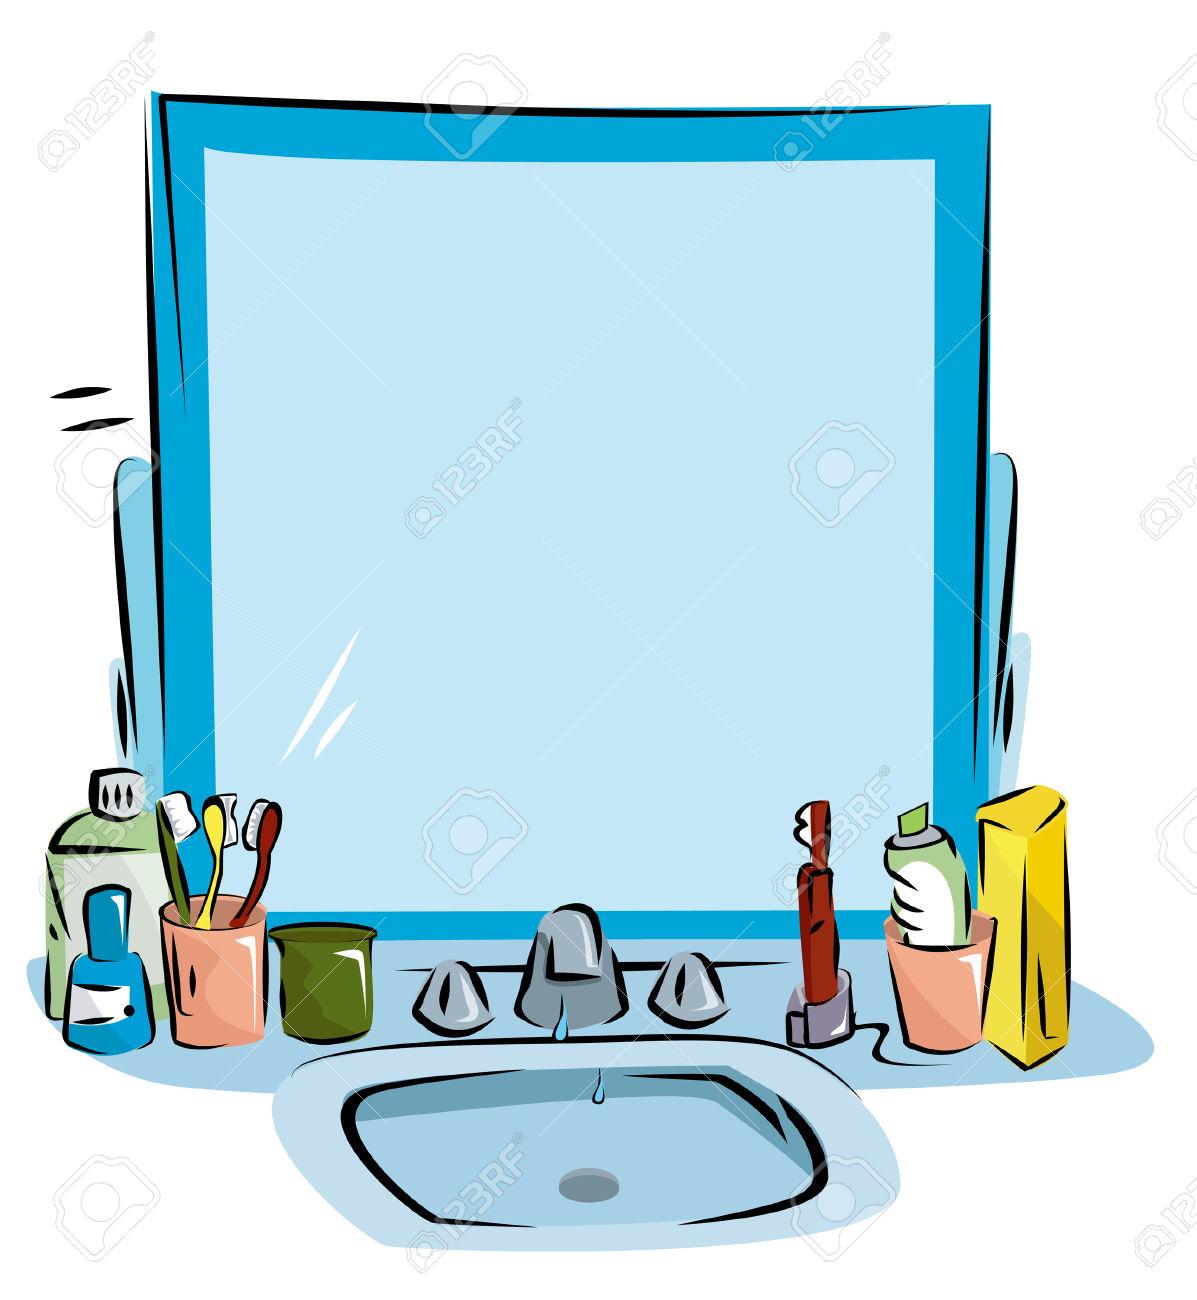 Bathroom clipart bathroom vanity, Bathroom bathroom vanity.